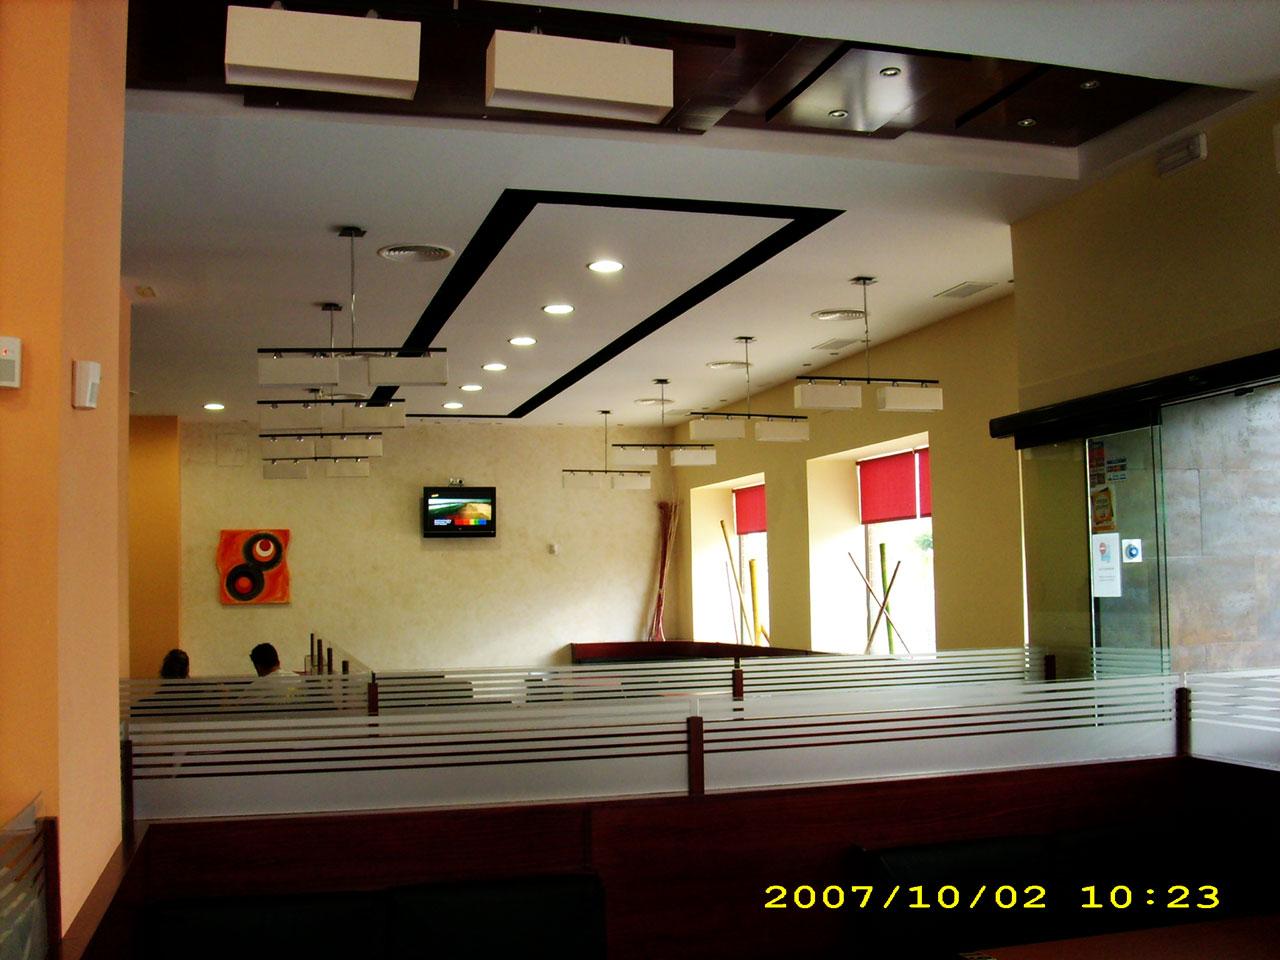 K2Ingenieros Ingeniería (Hostelería) - Restaurante Treze